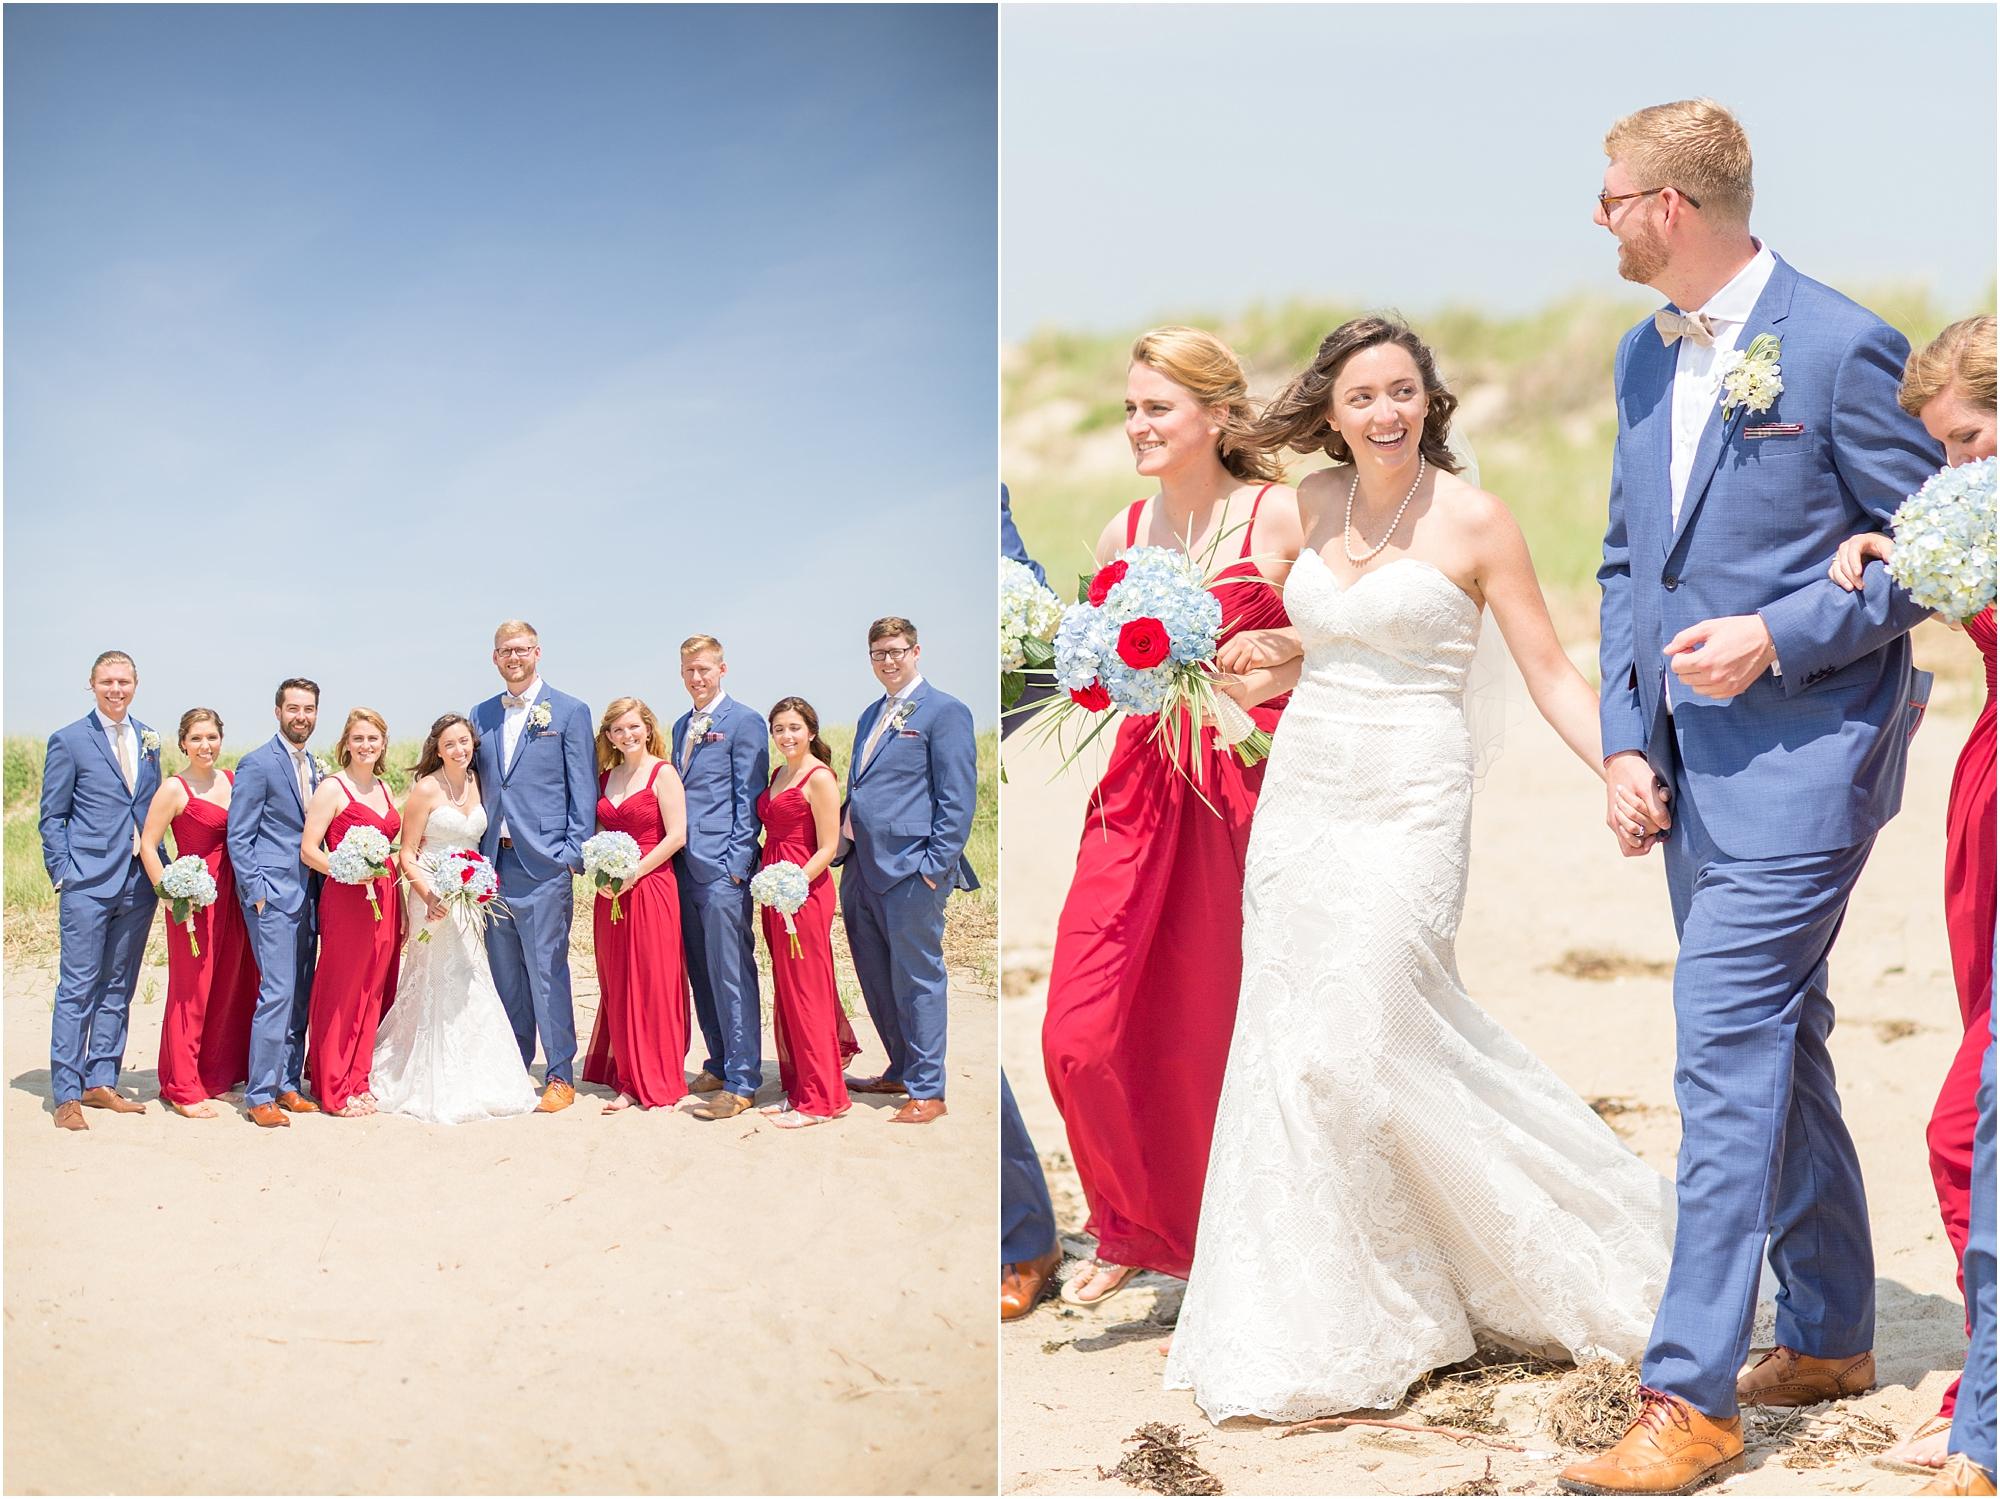 Goodman 4-Bridal Party-283_anna grace photography wellfleet cape cod massachusetts destination wedding photographer Chequessett Yacht and Country Club wedding photo.jpg